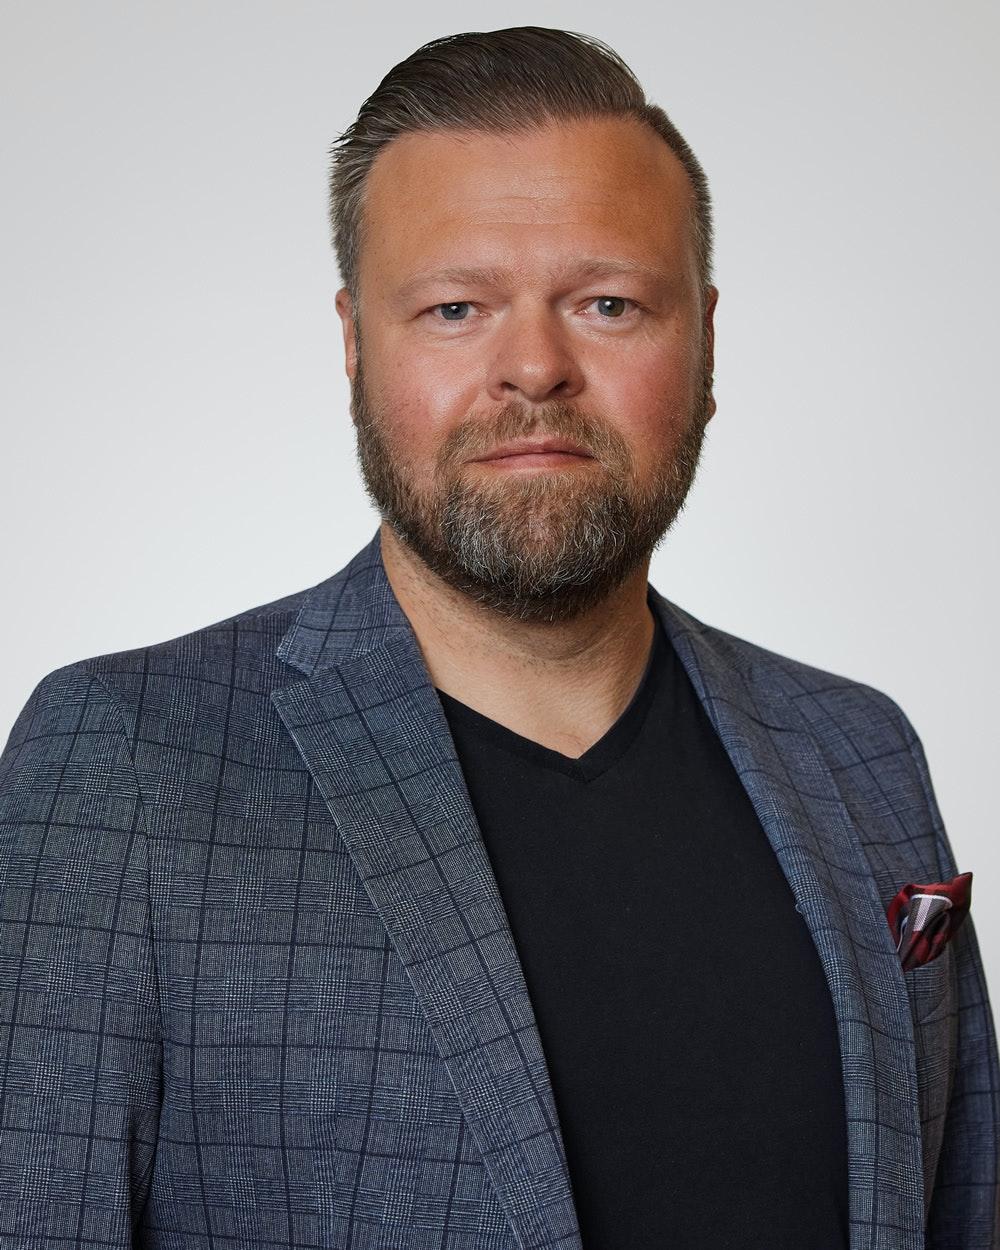 Georg Haraldsson